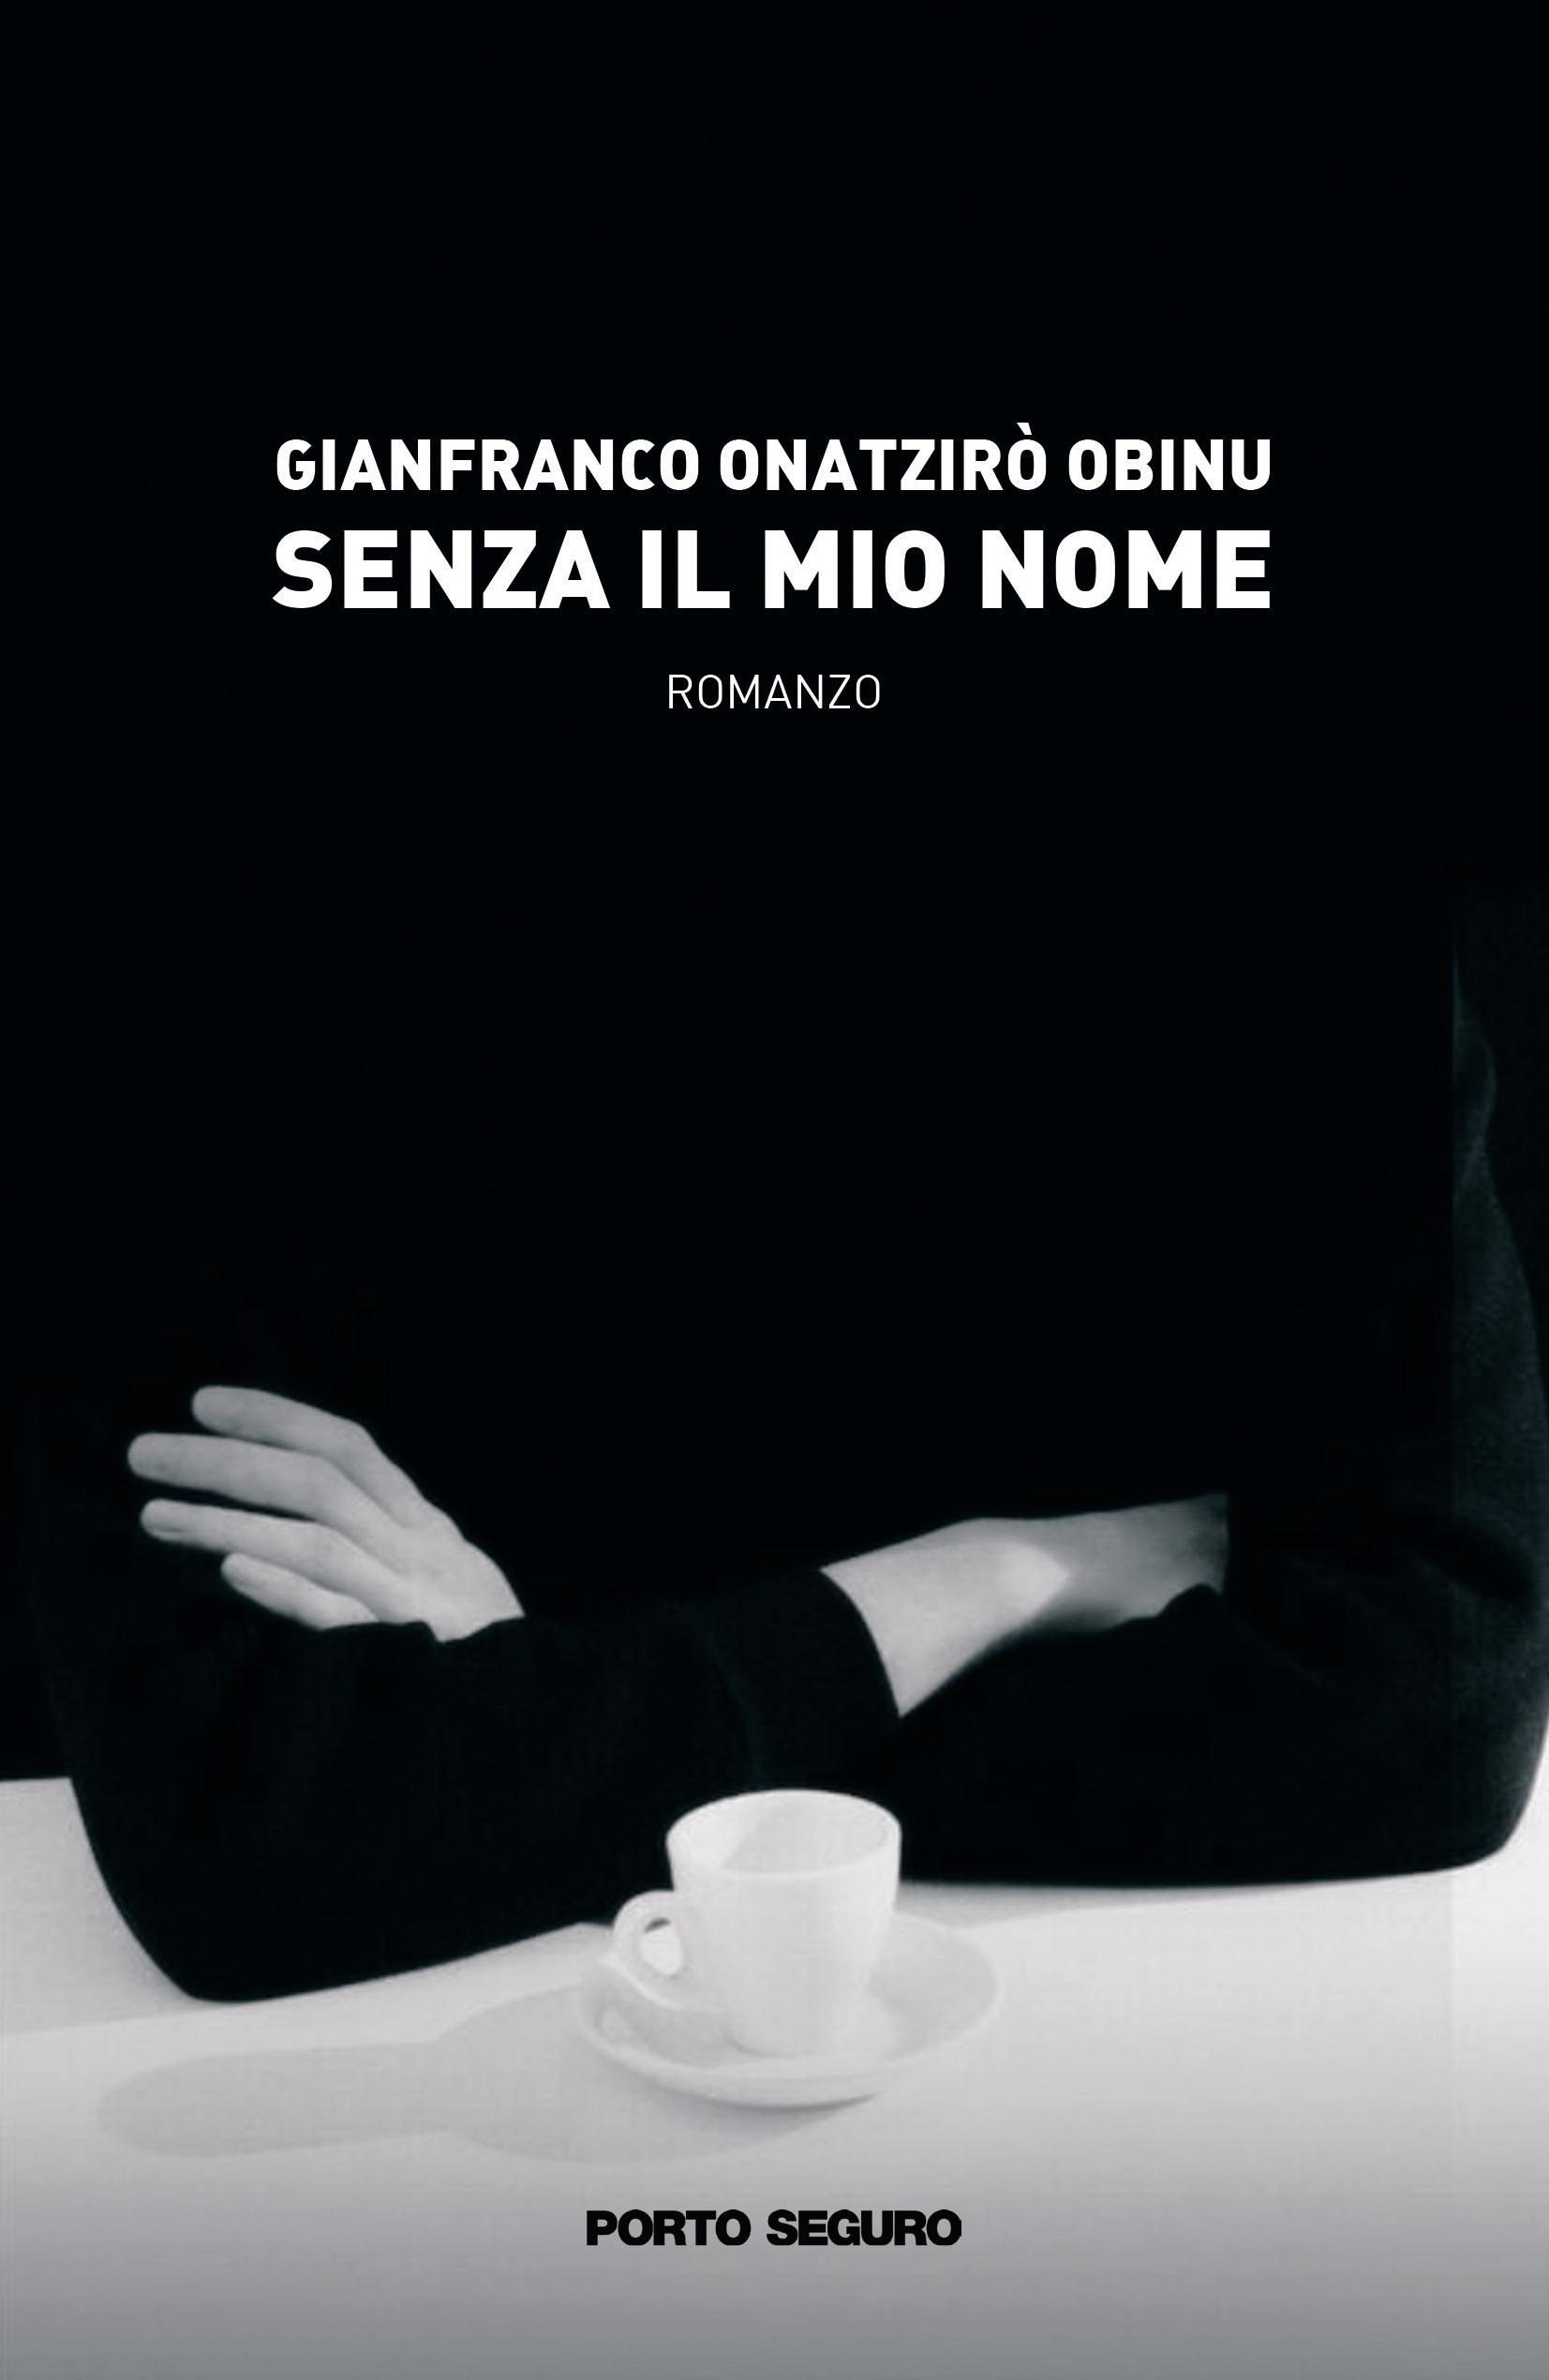 | Gianfranco Onatzirò Obinu